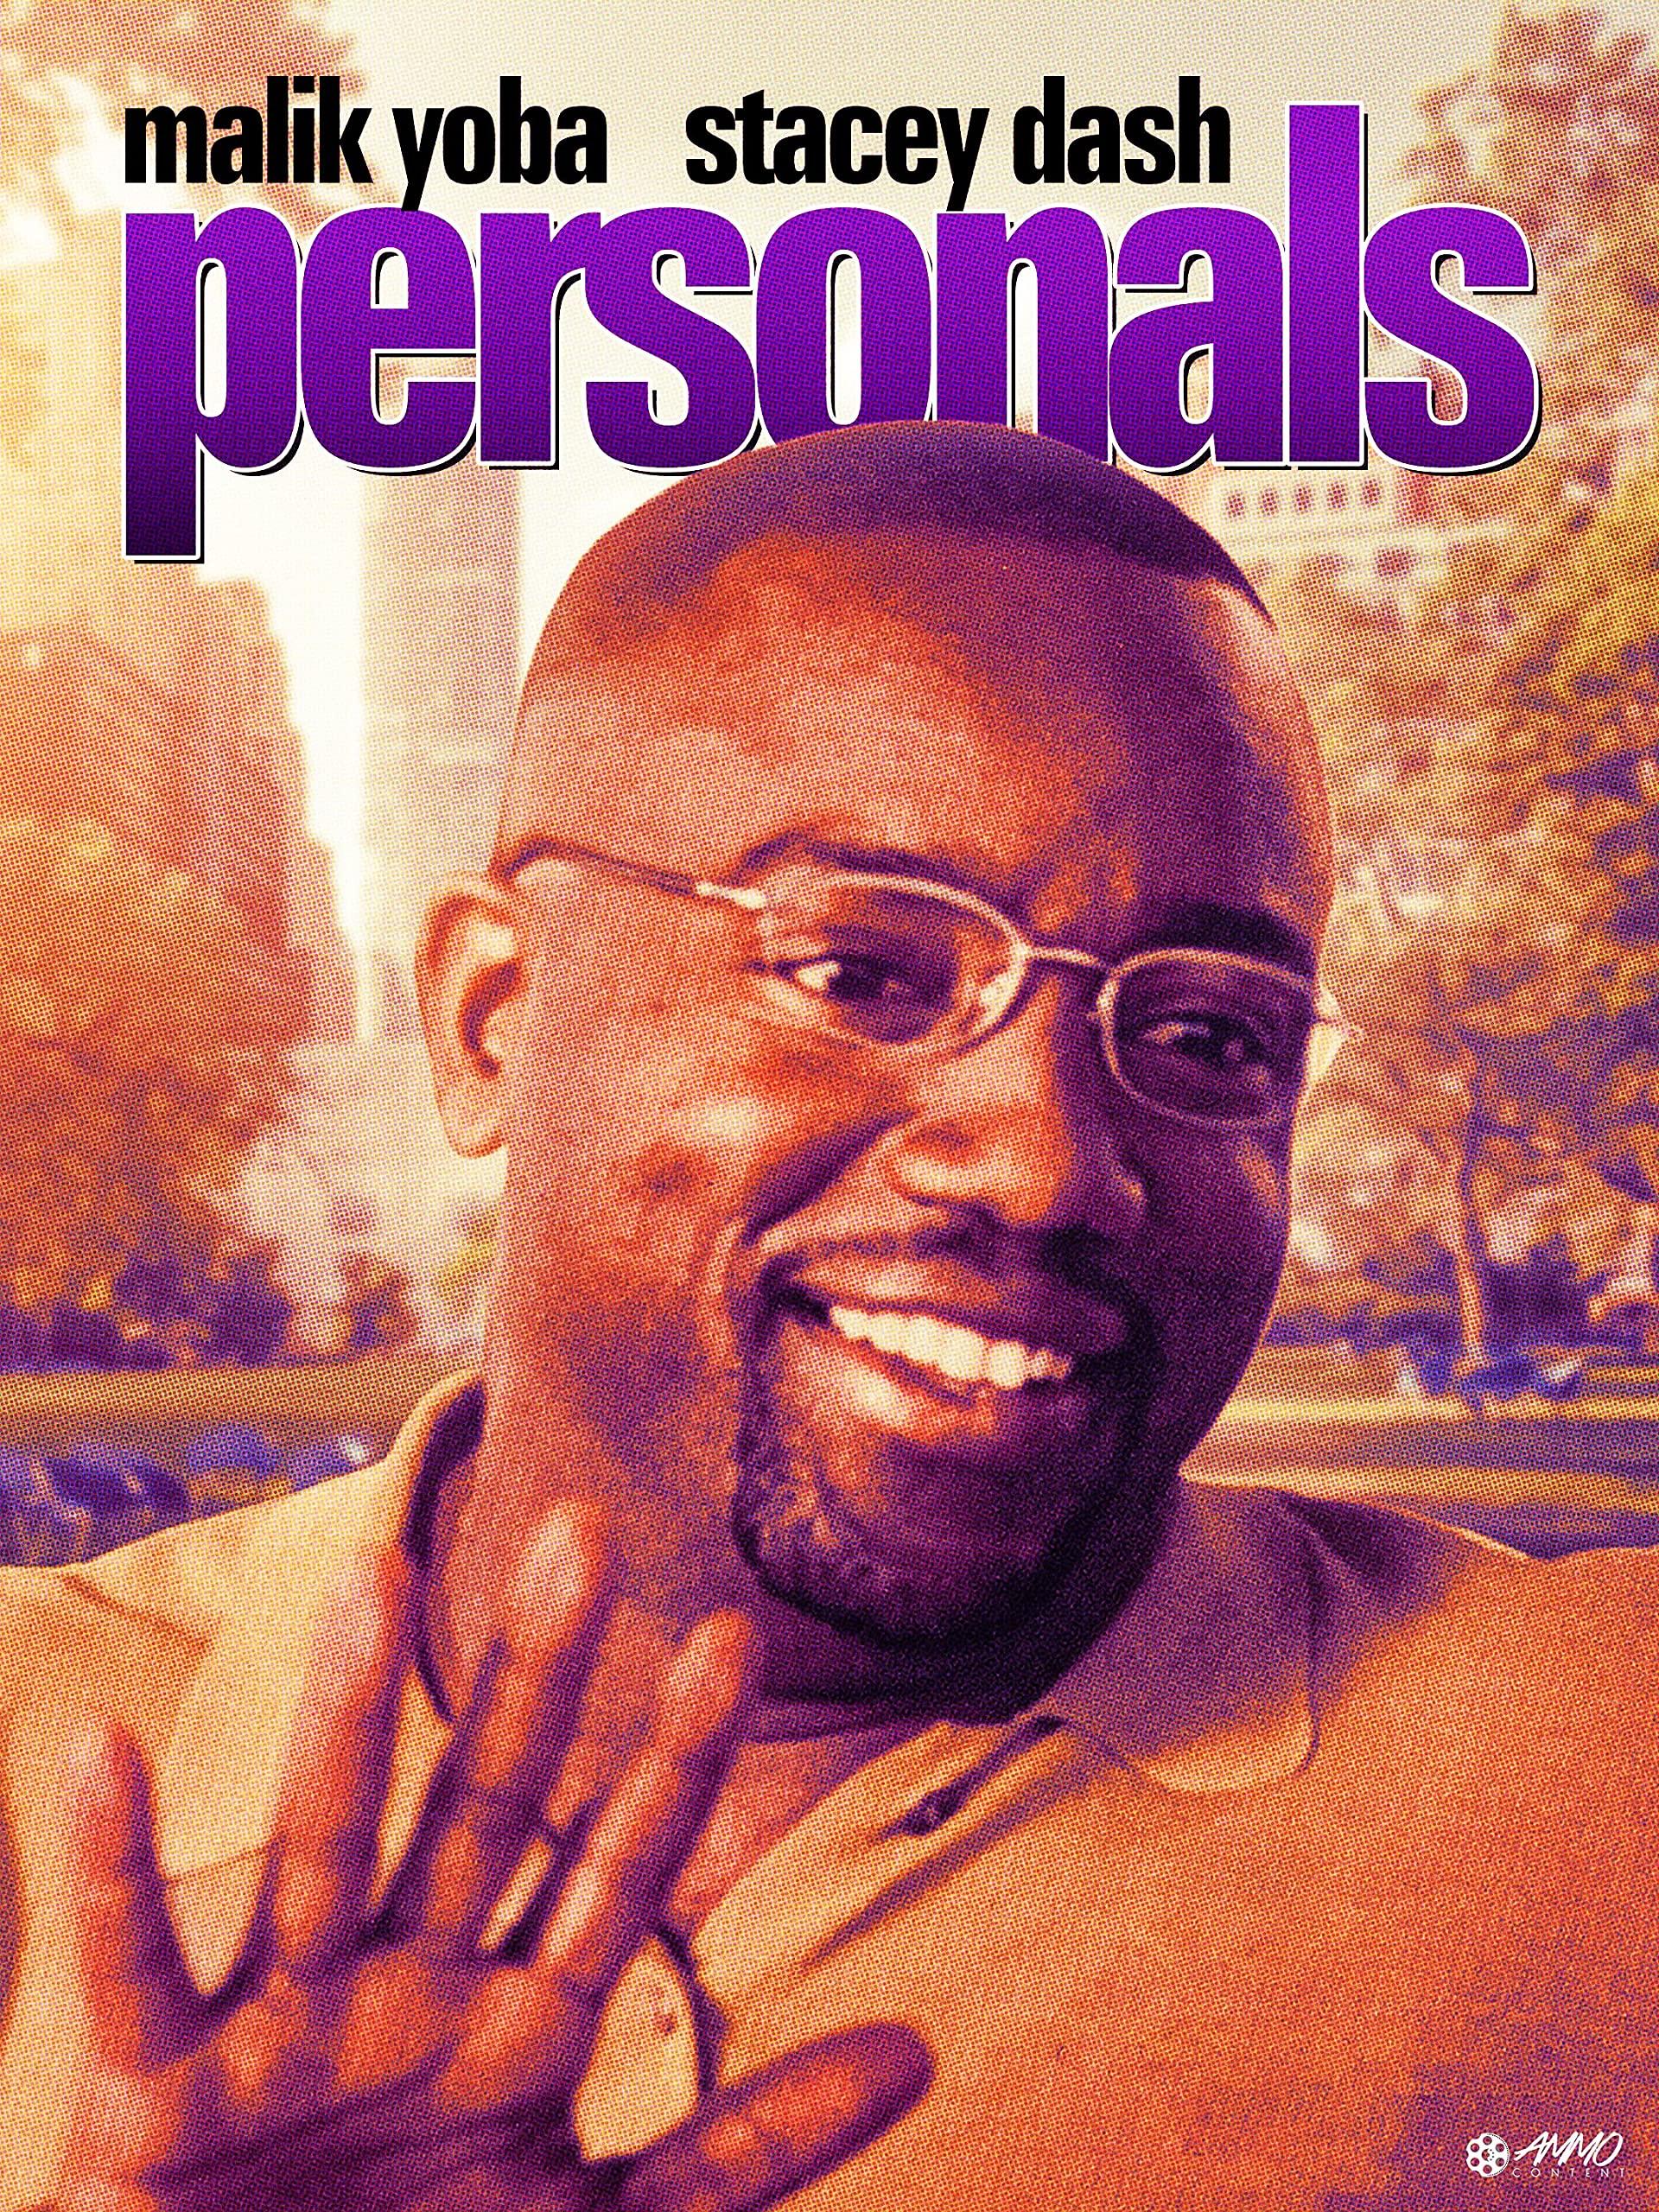 Personals on Amazon Prime Video UK